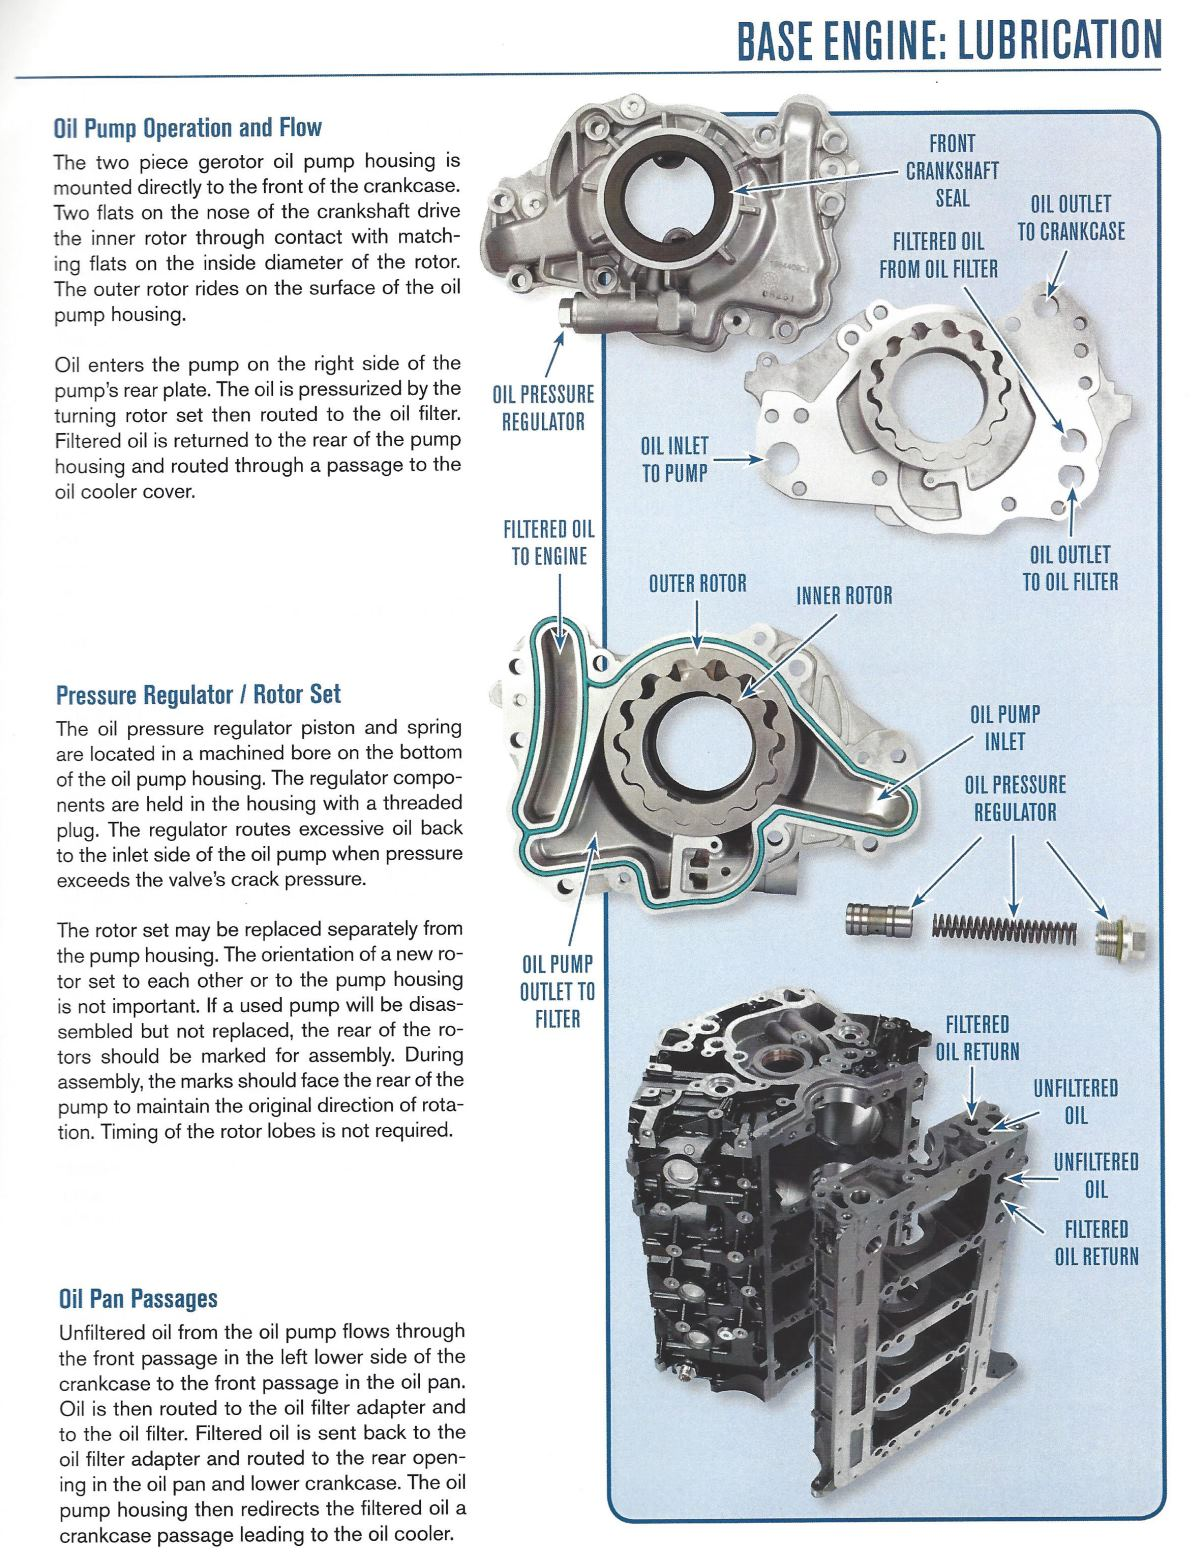 navistar ht 570 engine diagram navistar dt466  dt570  and ht570 manual truckmanuals com  navistar dt466  dt570  and ht570 manual